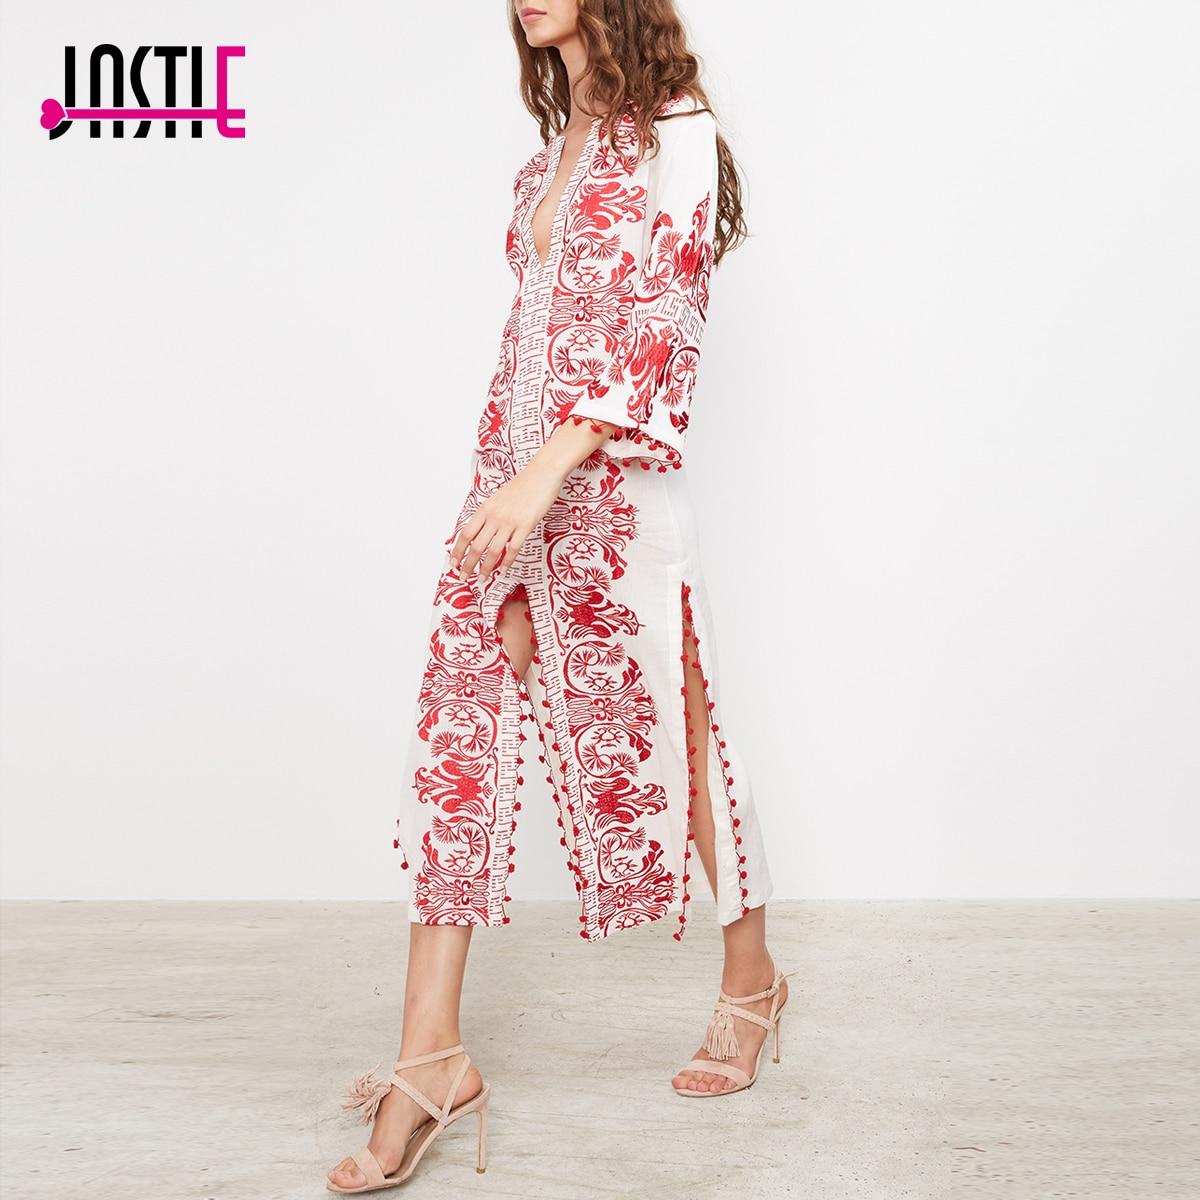 все цены на Jastie Red Embroidered Long Tunic Midi Dress Caftan Slits and Pom Pom Trim Chic Beach Boho Dress Summer Dresses Women Vestidos